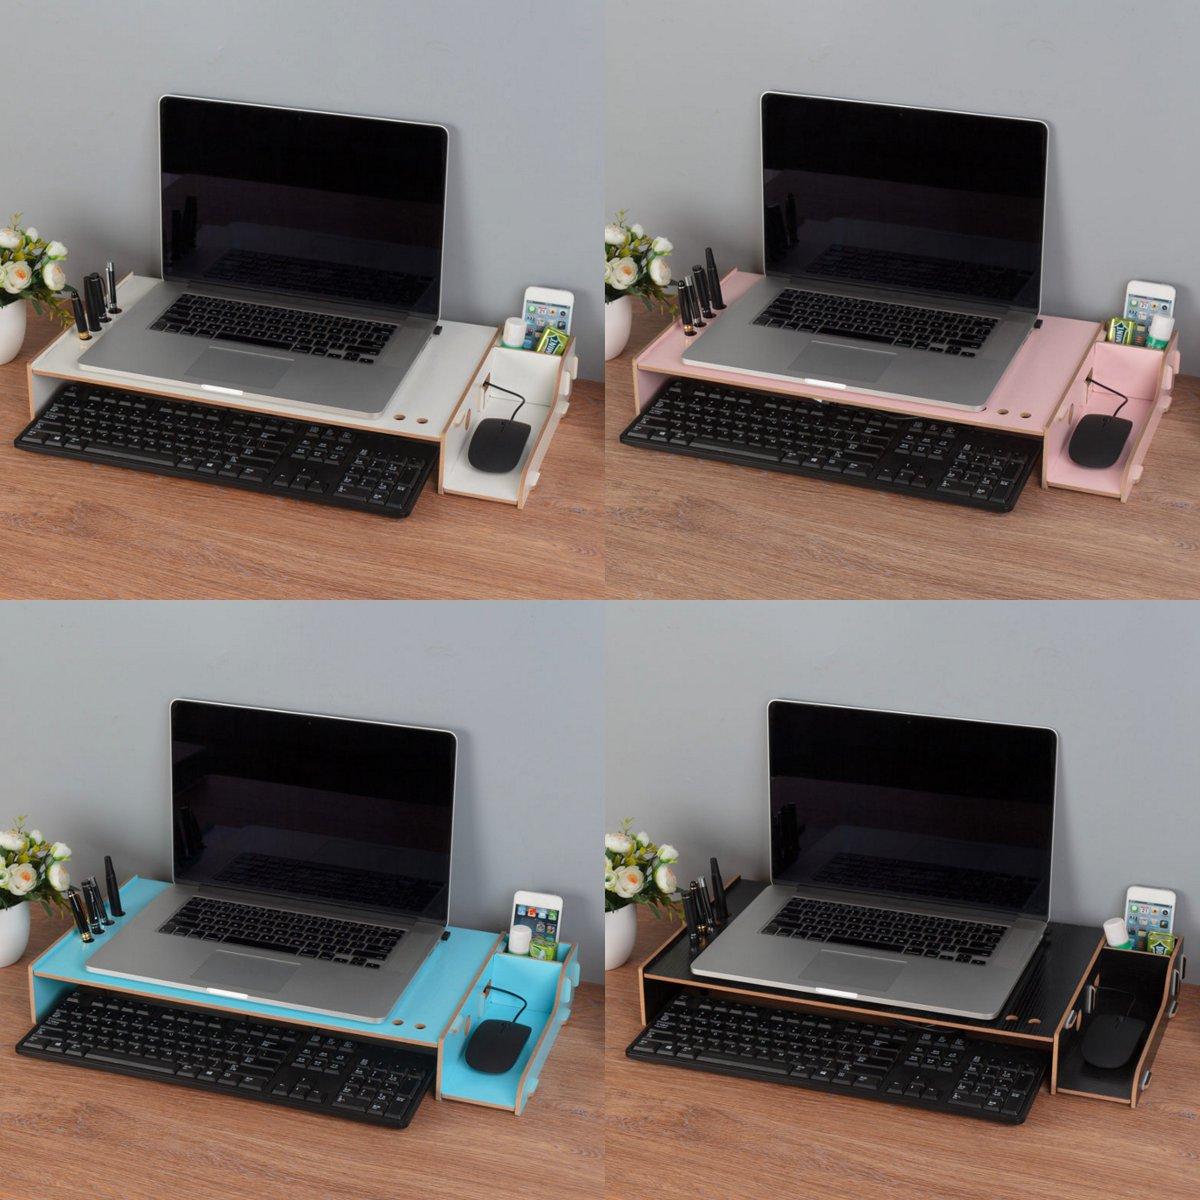 Soporte para TV portátil, soporte de madera para Monitor de escritorio, soporte de escritorio para pantalla elevadora, soporte de escritorio para portátil